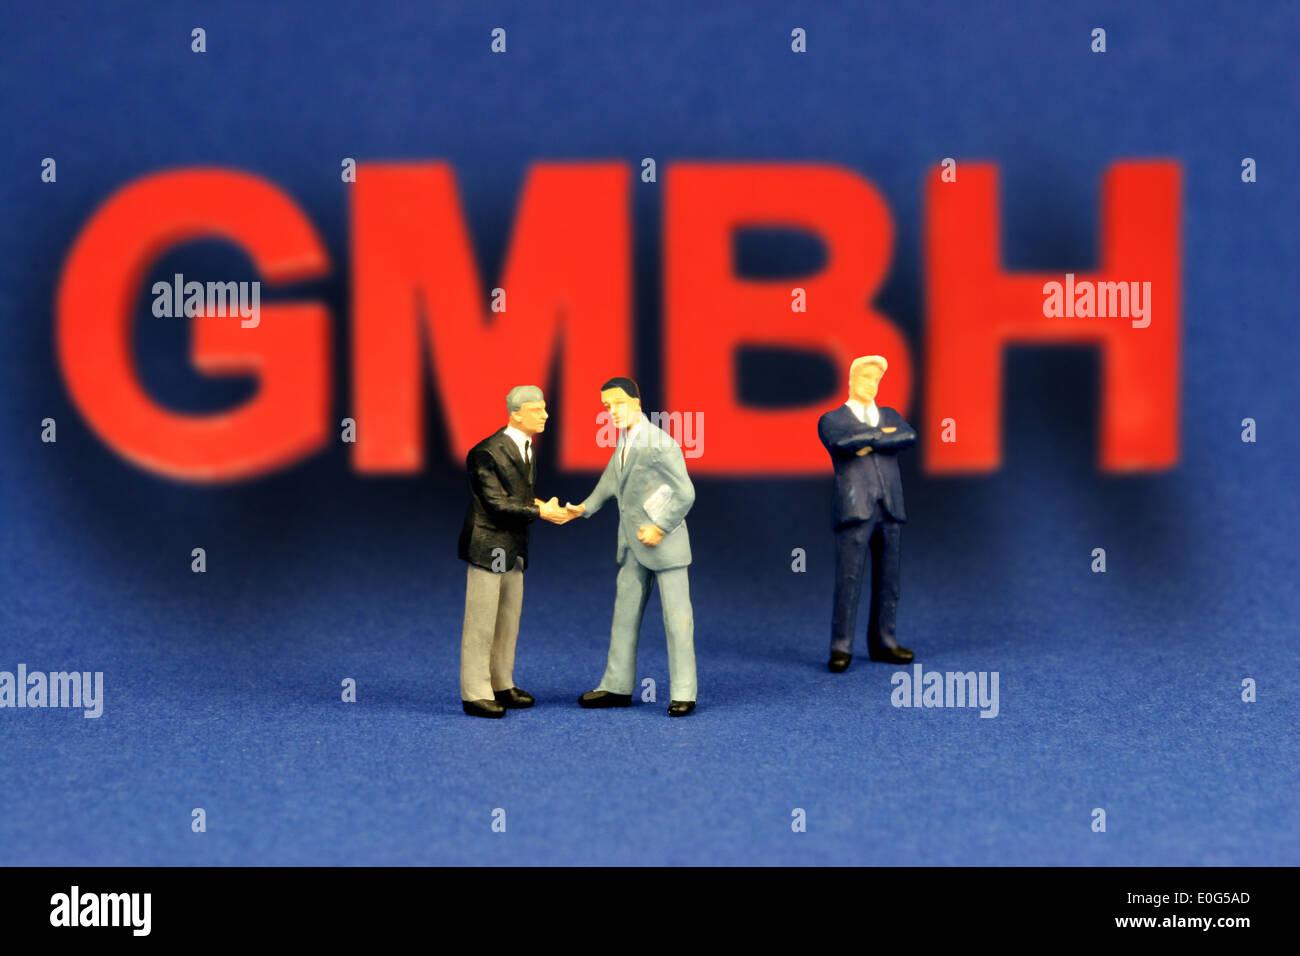 Gmbh and figures, company, companies, company form, company foundation, company foundation, branch, branches, company, companies - Stock Image